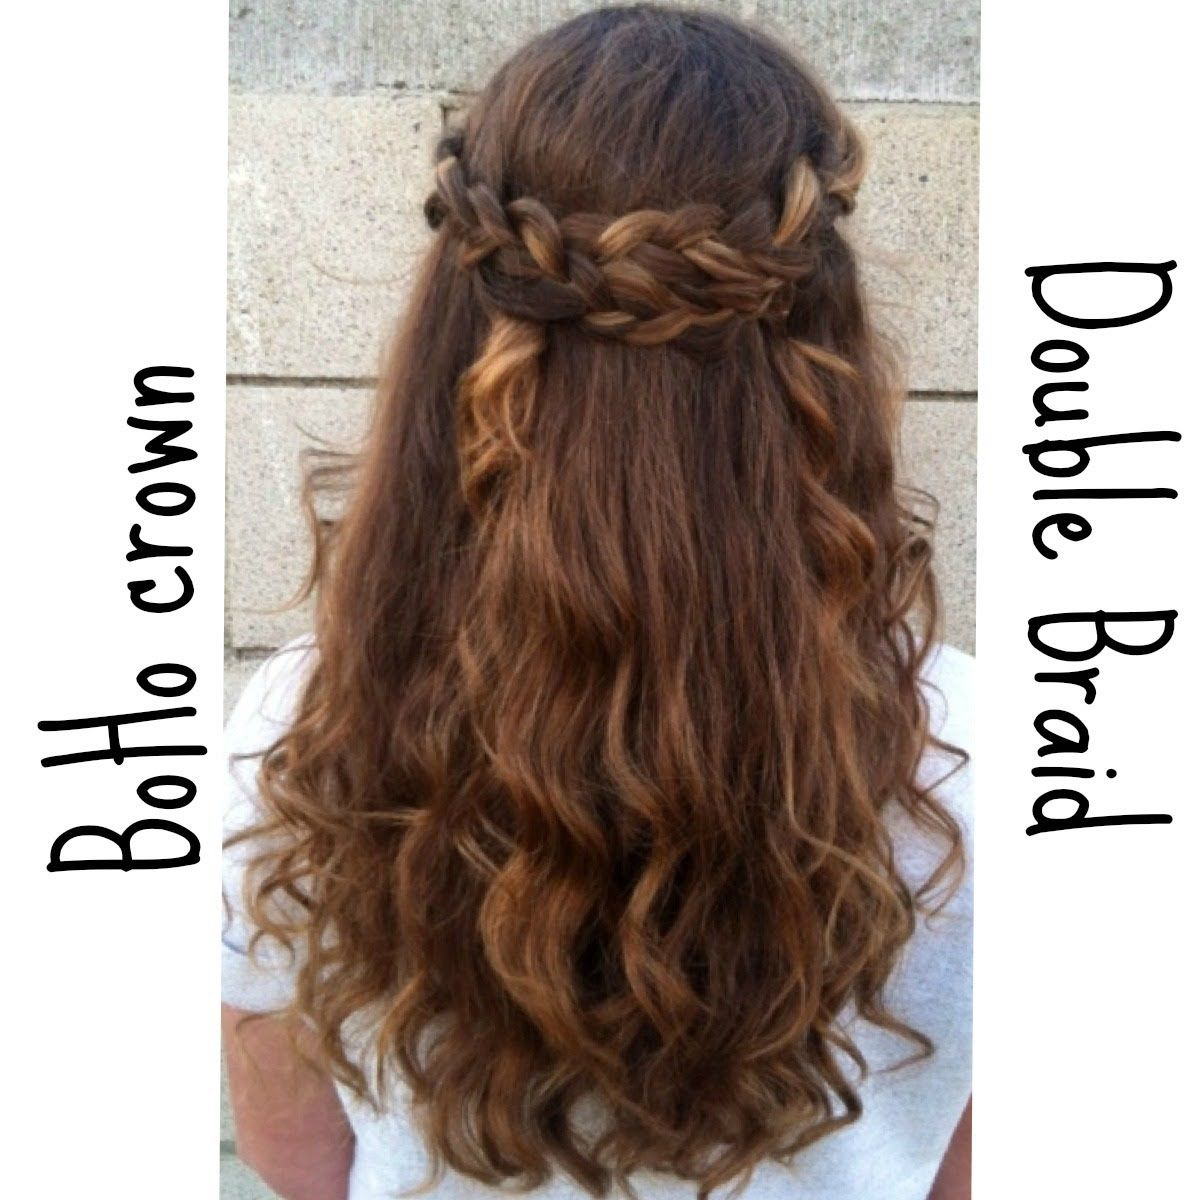 Braided half up half down hairstyle | Hair & Make Up ...